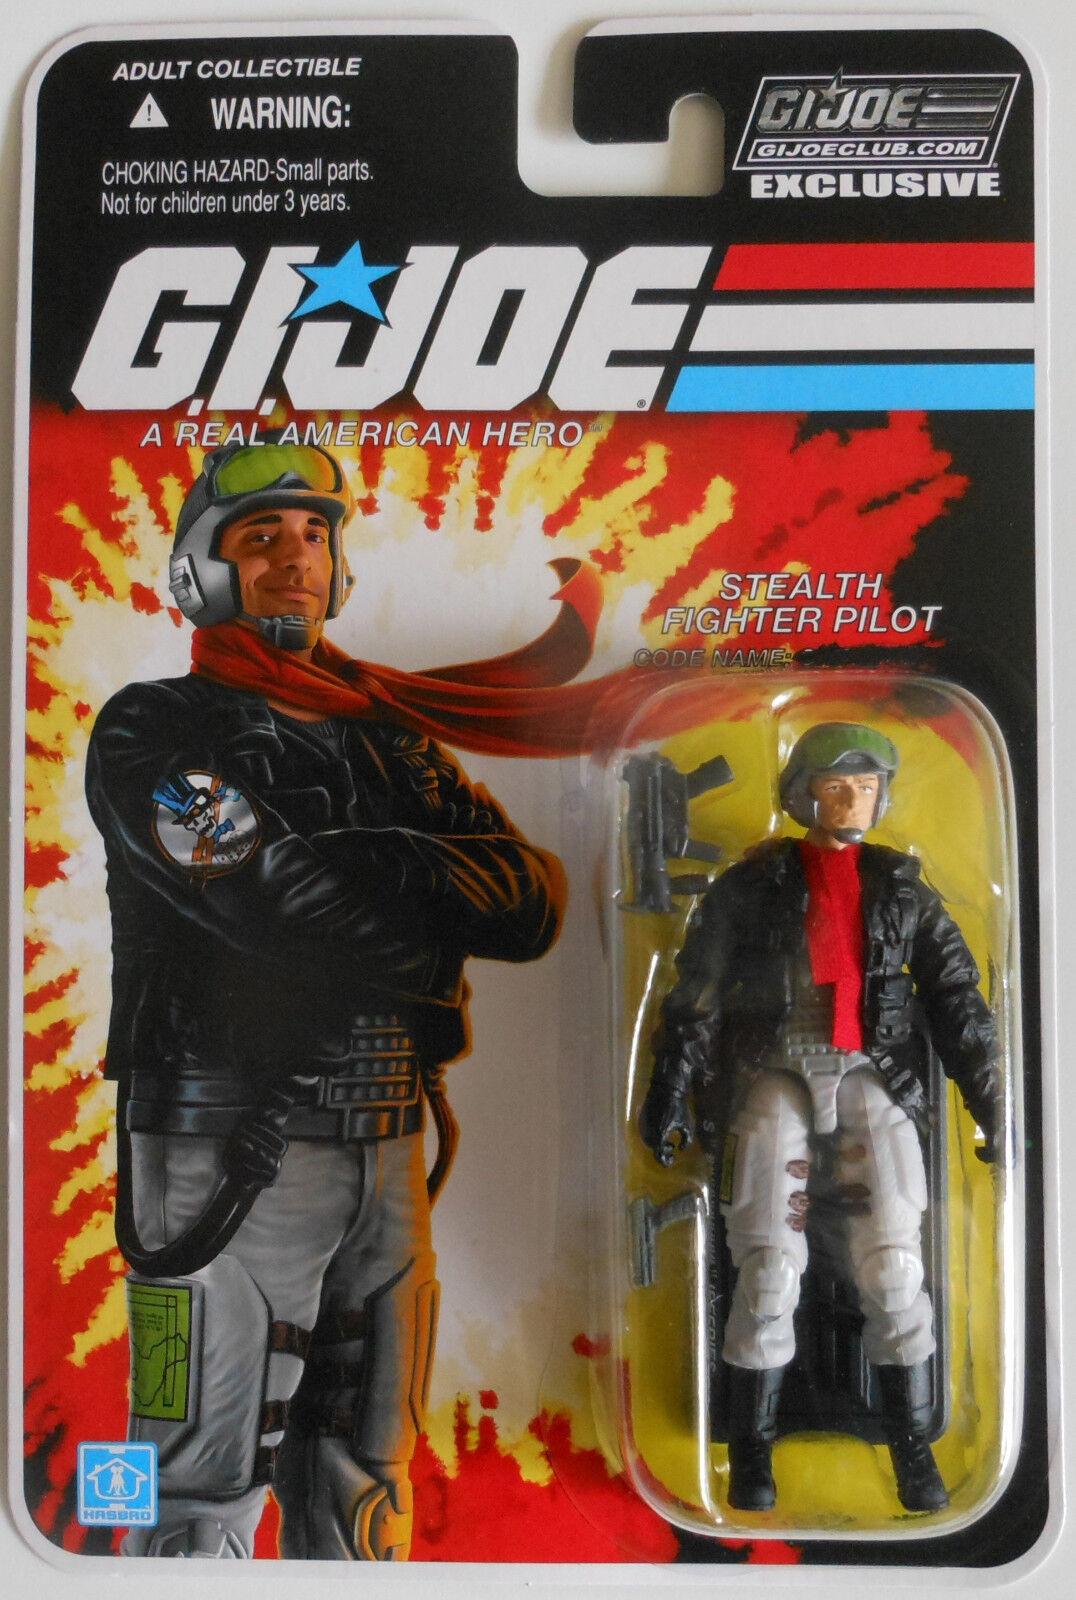 GHOSTRIDER GI Joe Cobra FSS 6.0 MOC GI Joe Club Exclusive